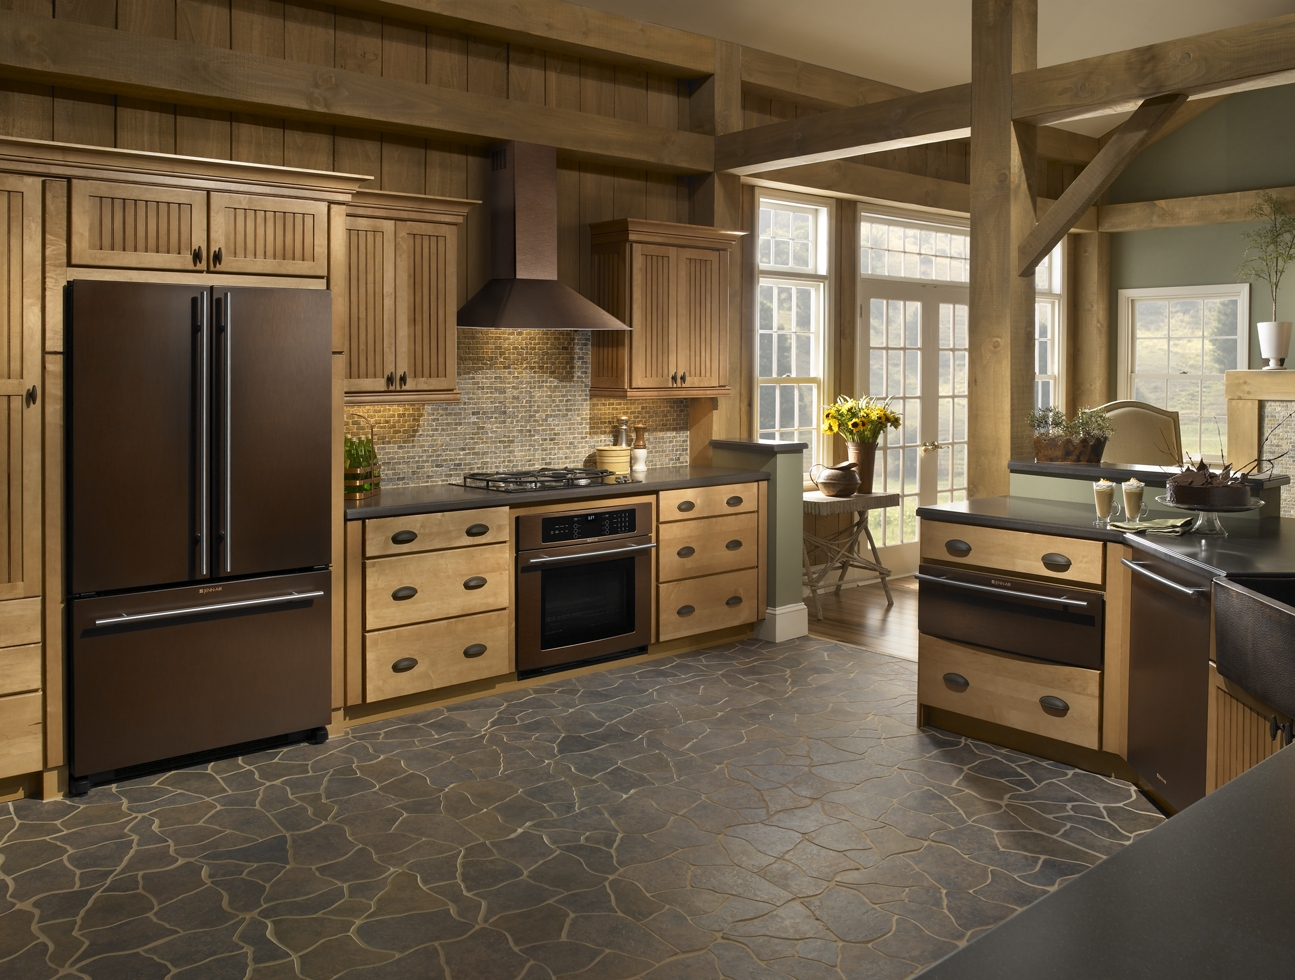 bronze kitchen appliances ninja mega complete system 1500 blender & food processor and residential design jenn air s new finish oiled